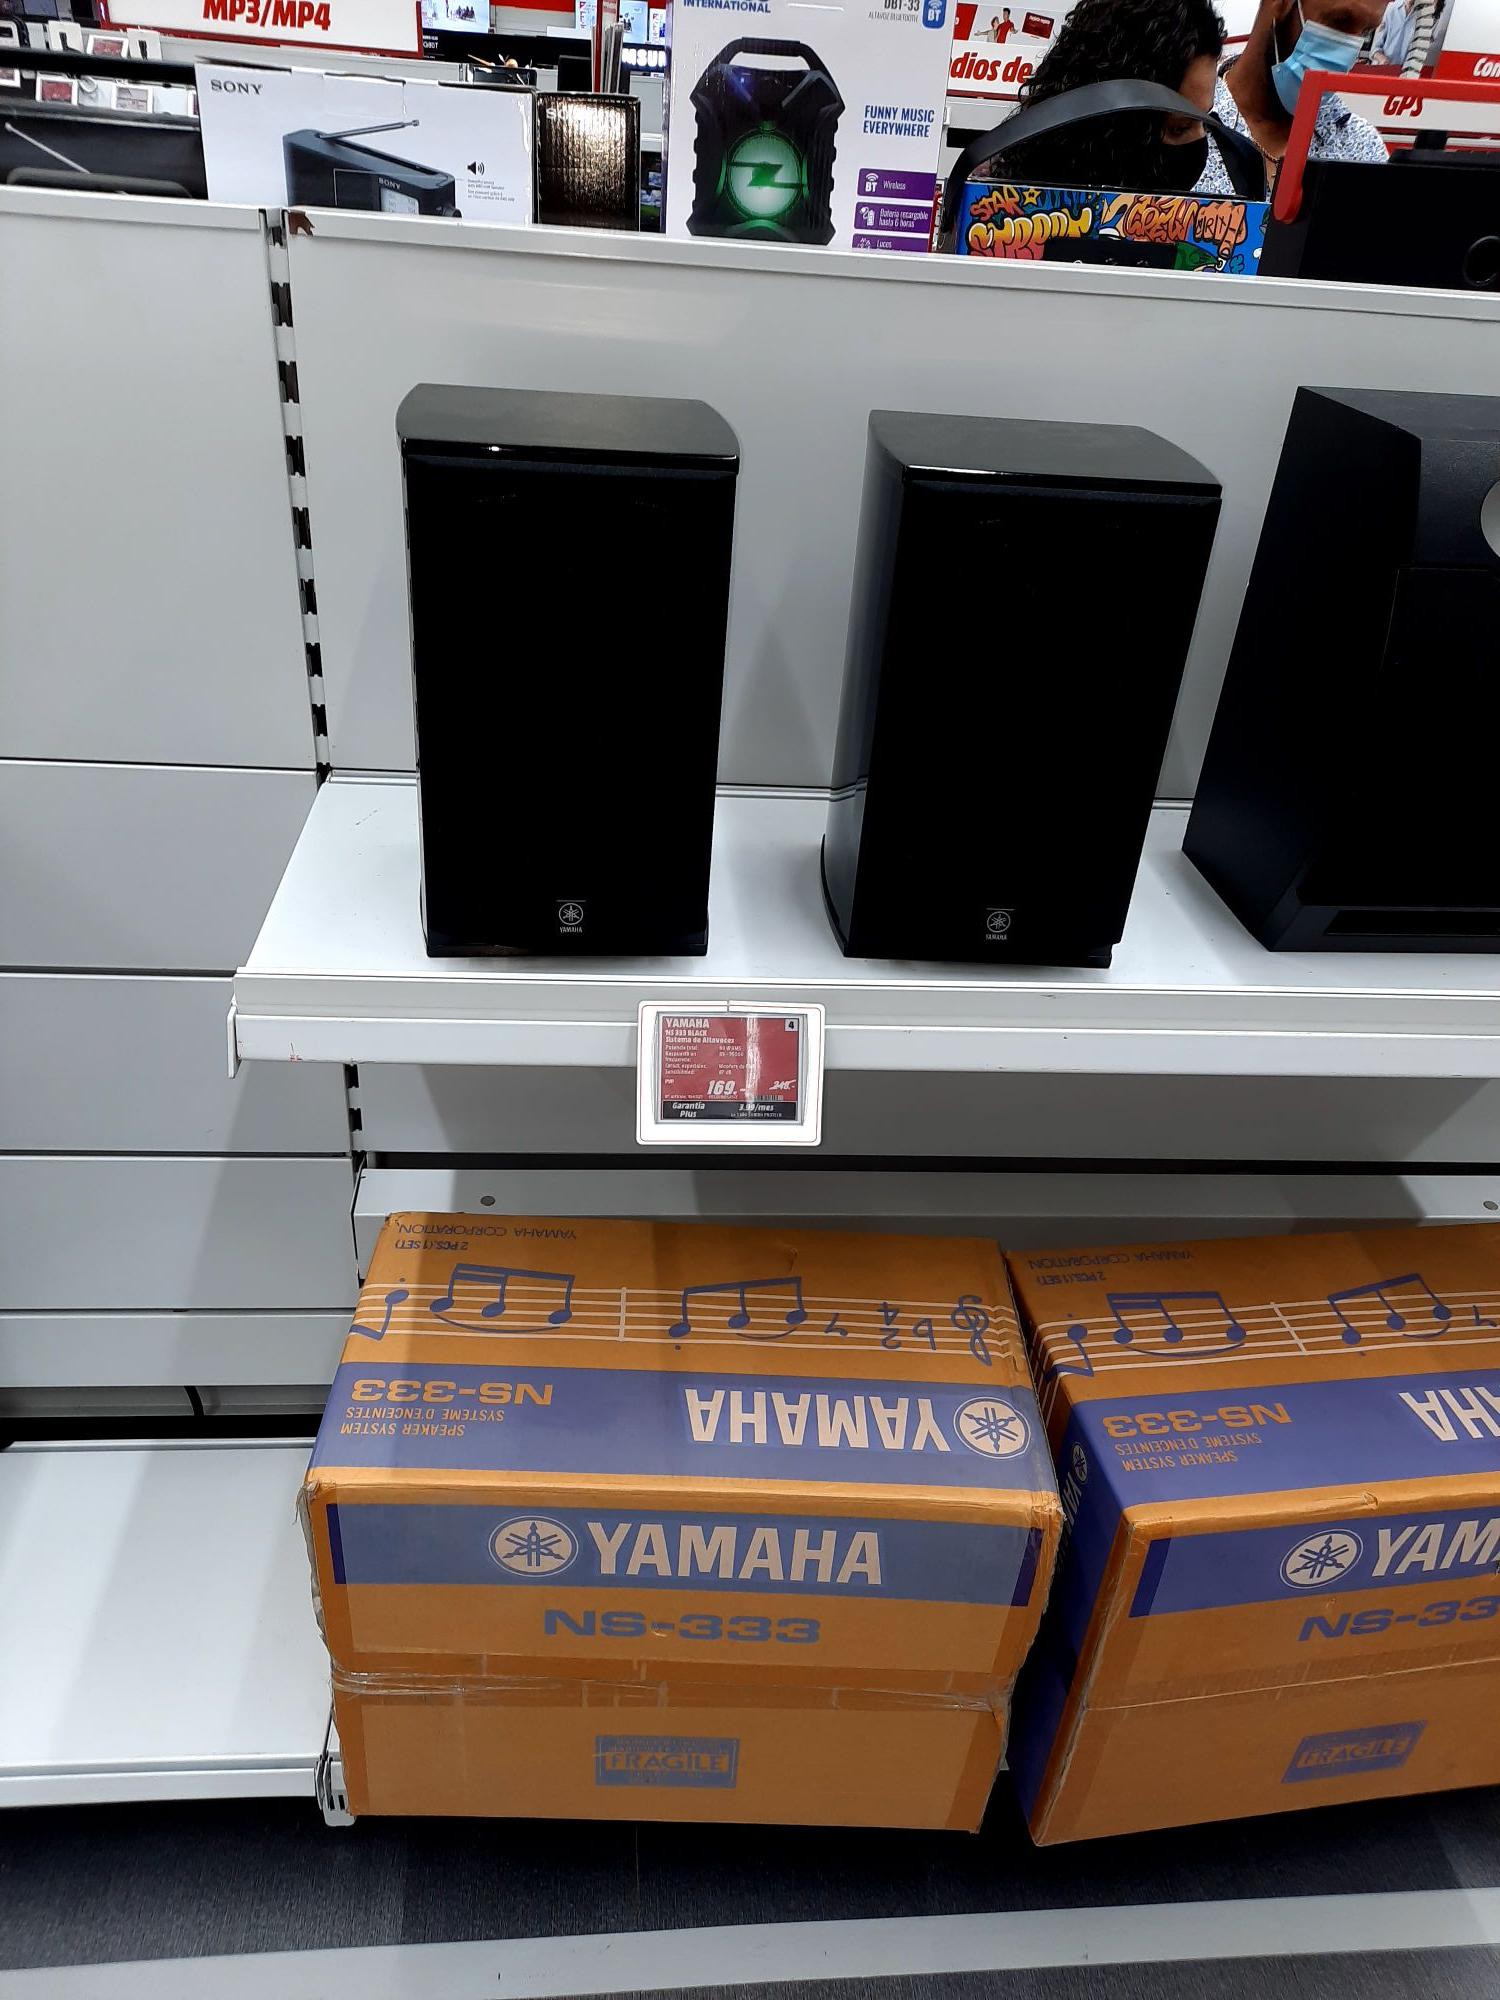 Yamaha NS 333 - En el Mediamarkt de Huelva